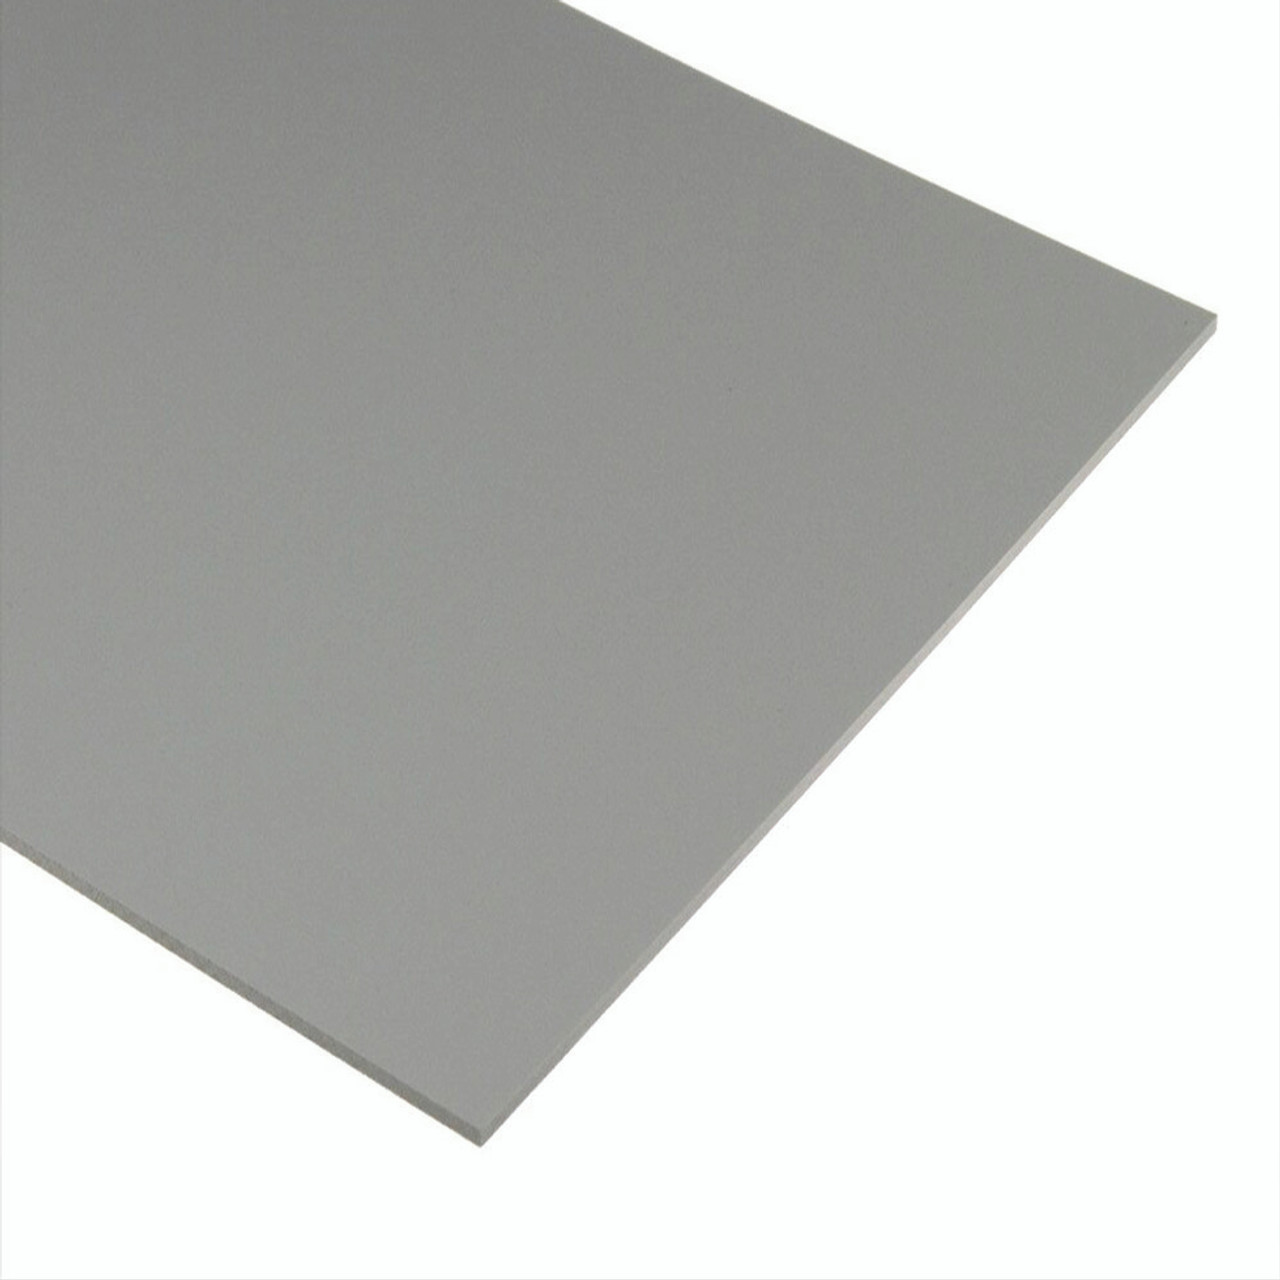 "4' X 8' X 1/8"" Grey Acrylic - Glossy"